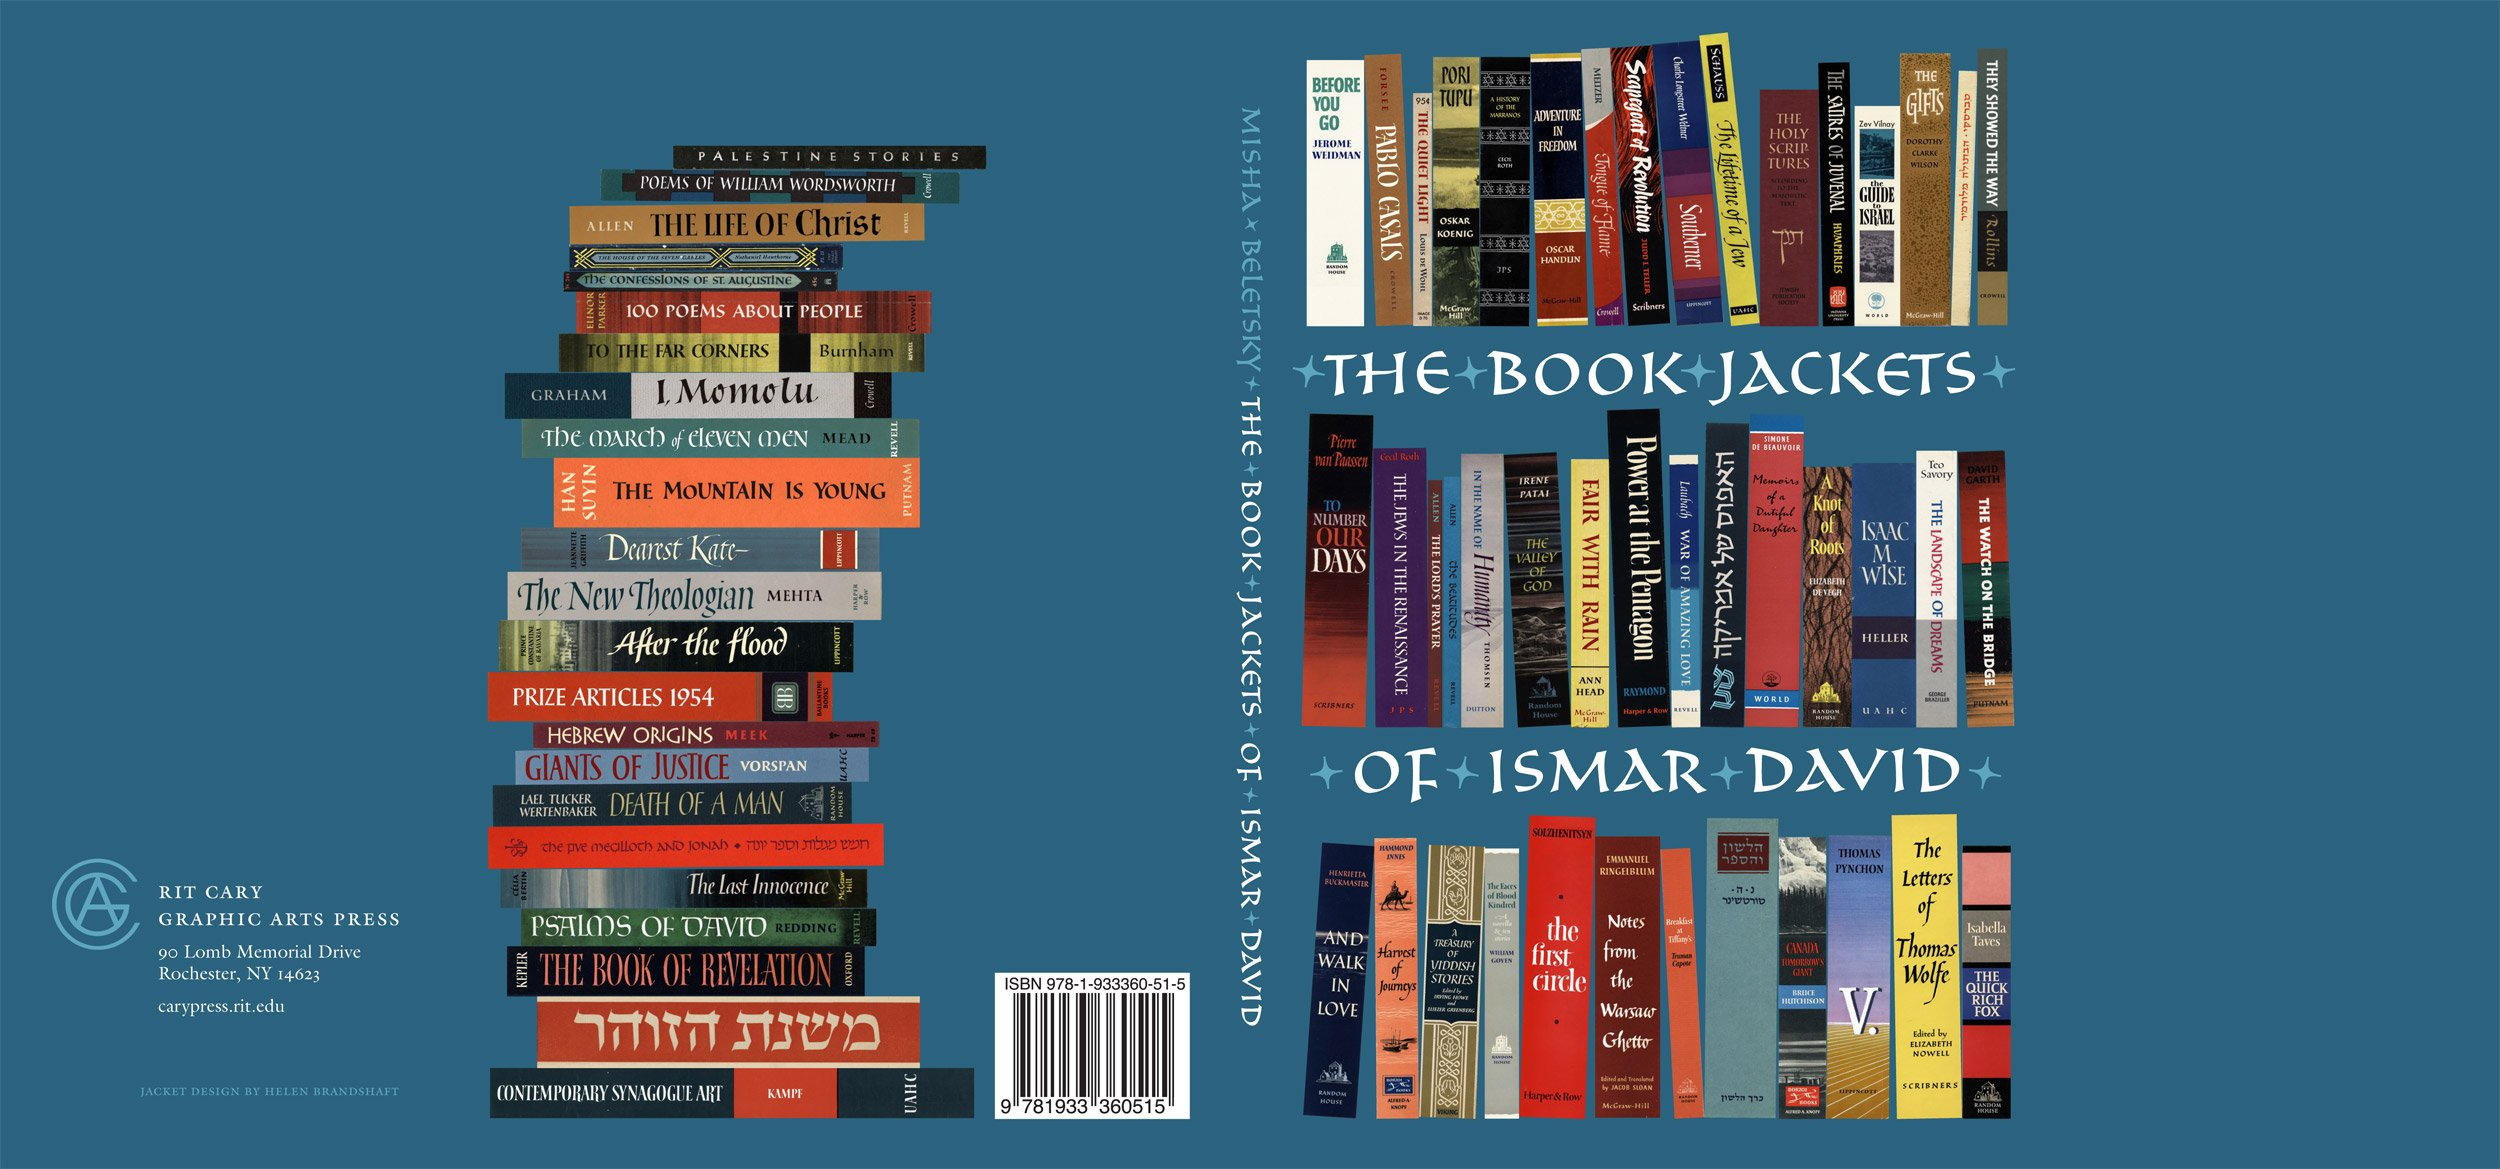 Download The Book Jackets of Ismar David ebook